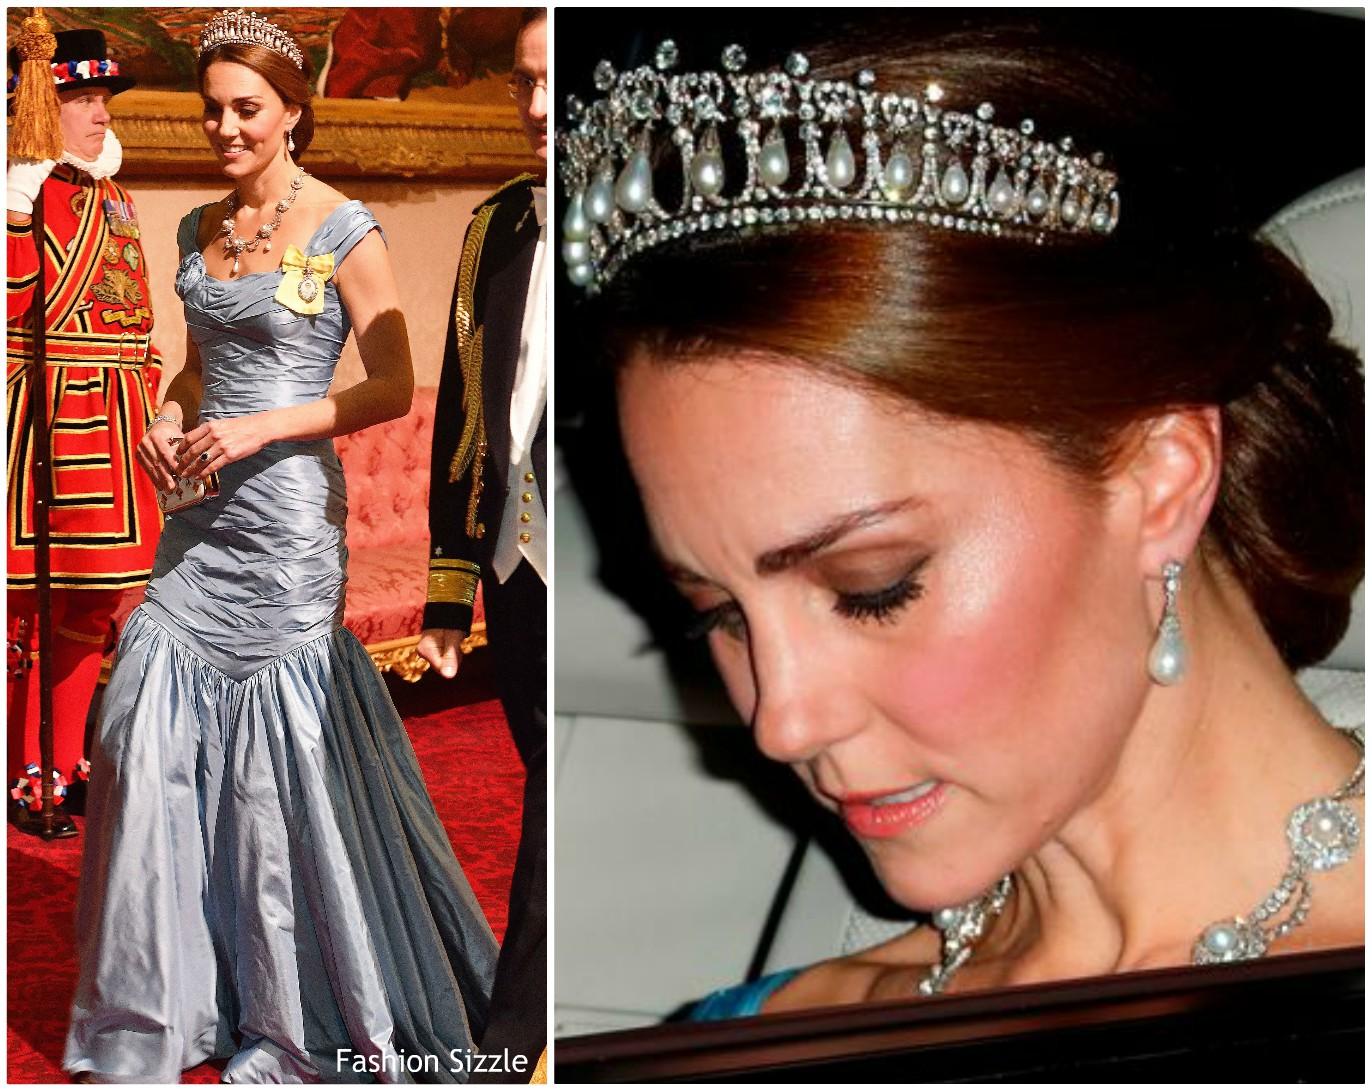 kate-middleton-wears-princess-dianas-tiara-diamond-necklace-state-banquet-buckingham-palace